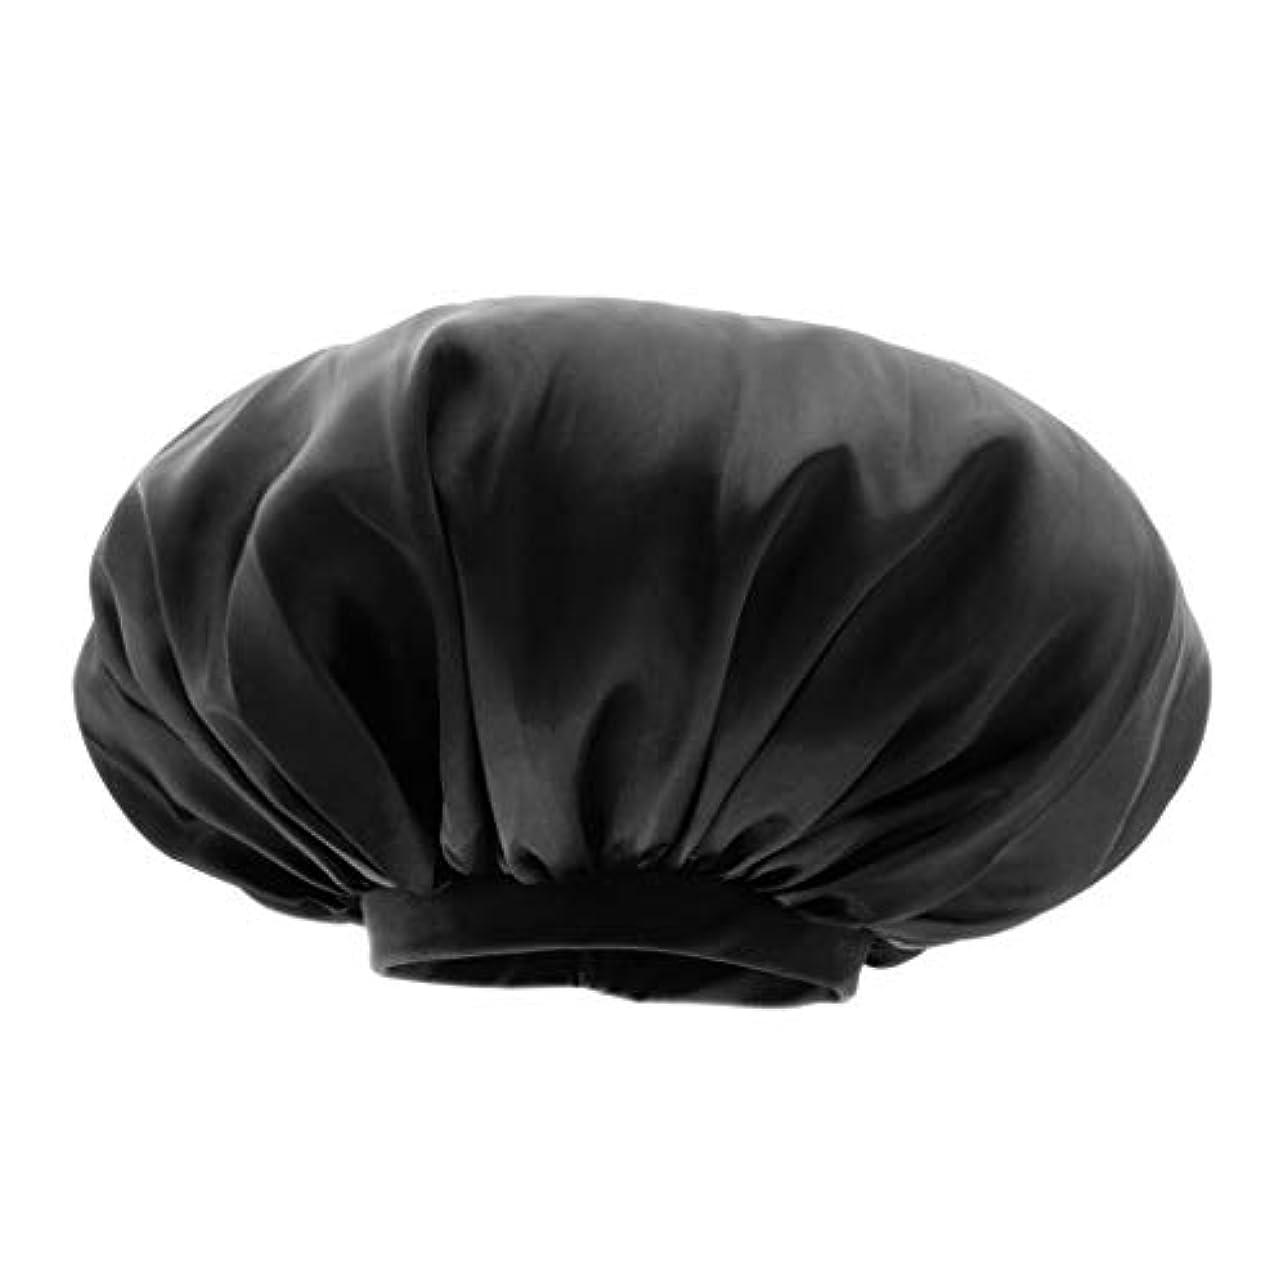 Sharplace シャワー キャップ サテン 美容 キャップ ヘアキャップ スリープキャップ 全6色 - ブラック